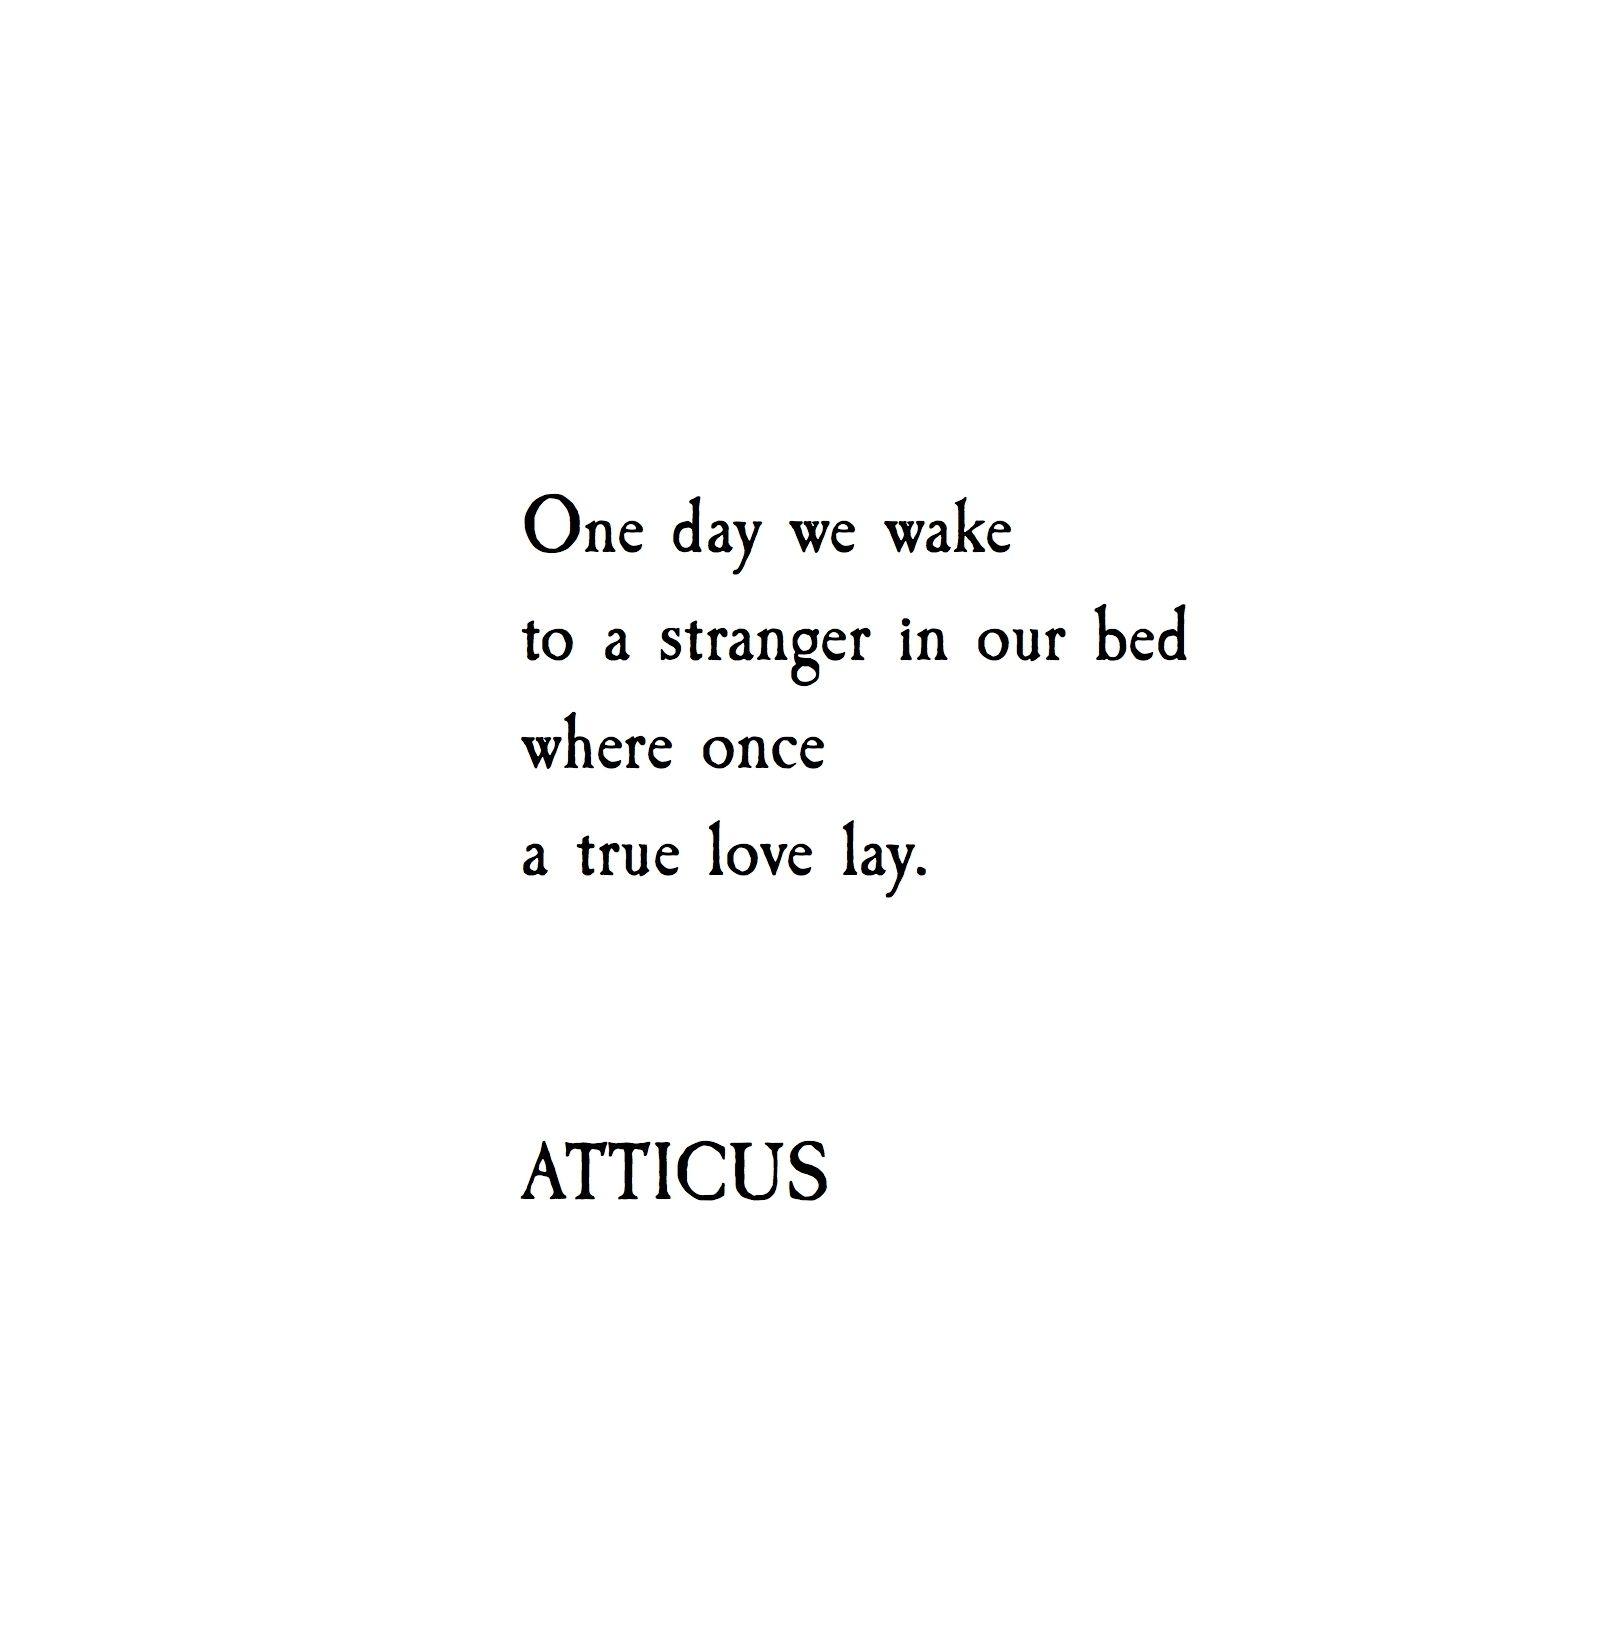 One Day Atticuspoetry Atticus Poetry Love Stranger